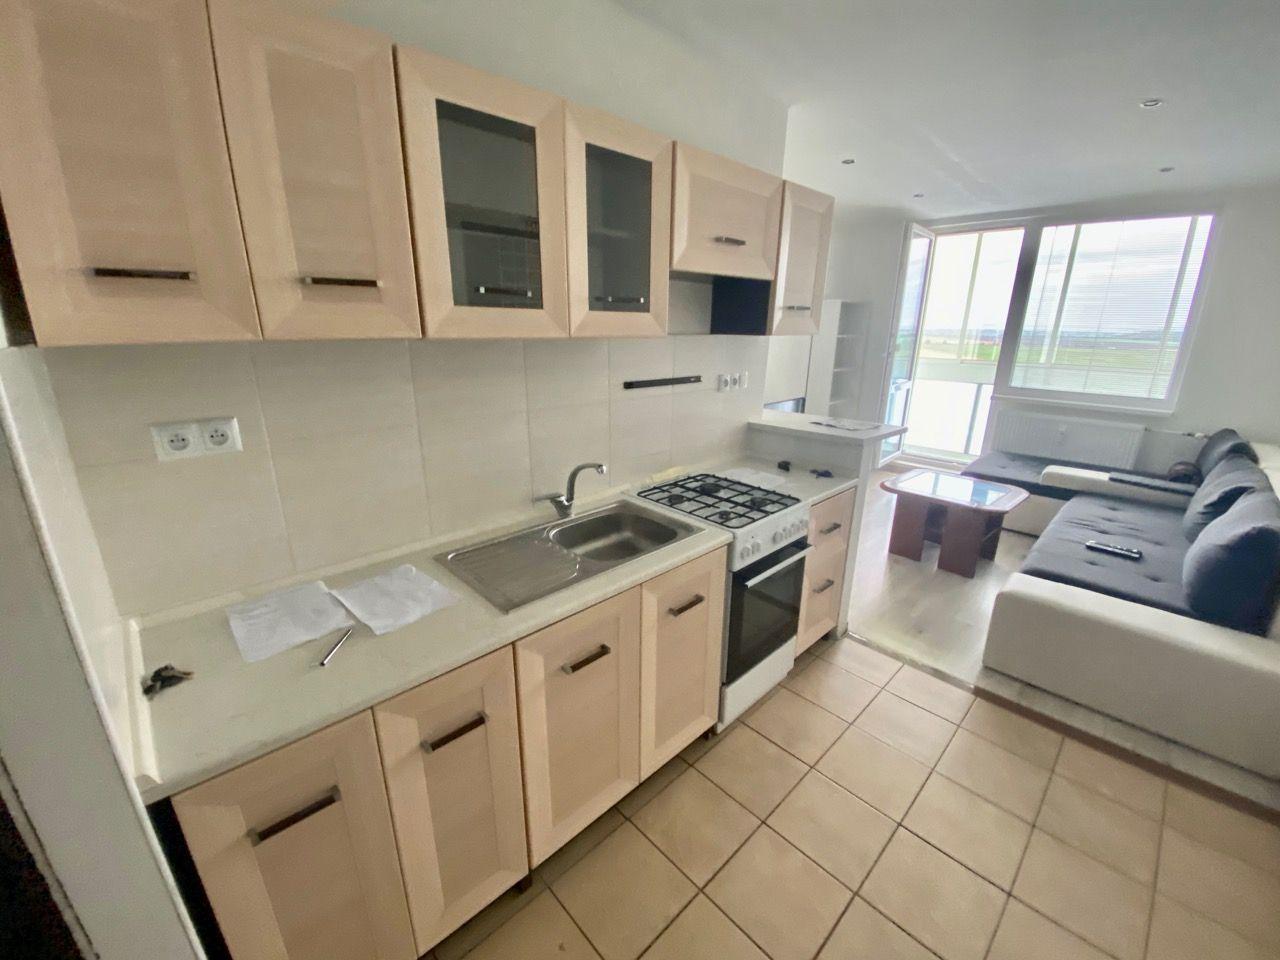 2-izbový byt-Predaj-Trnava-102 700 €